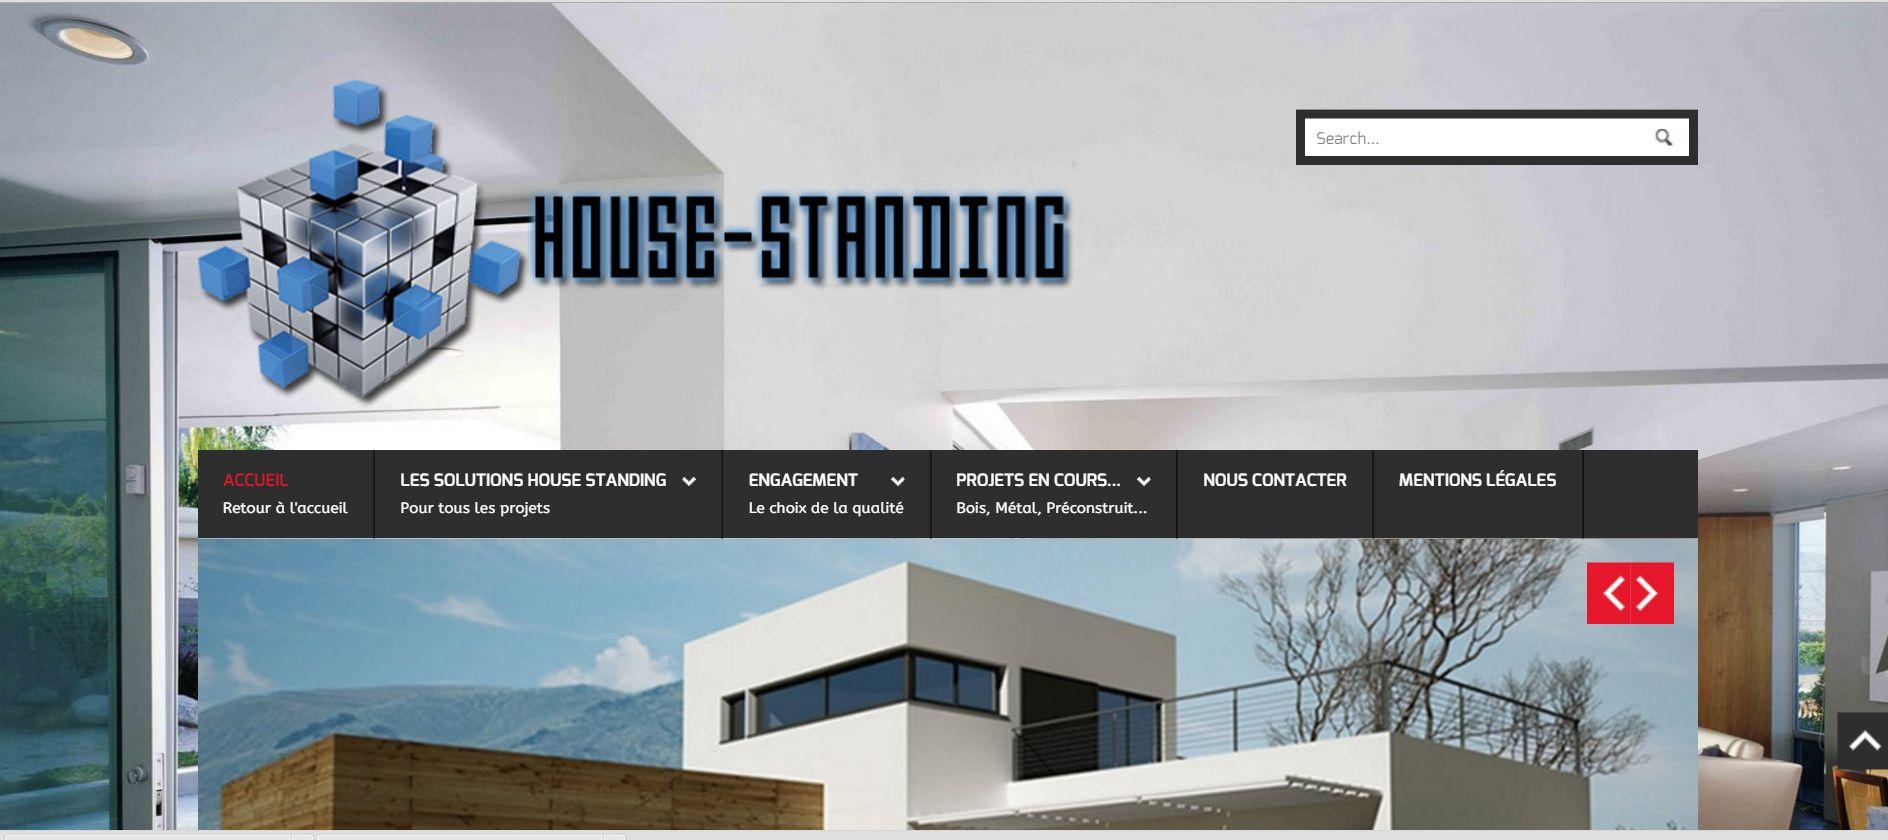 House Standing 29360 CLOHARS CARNOET, plancher chauffant Caleosol